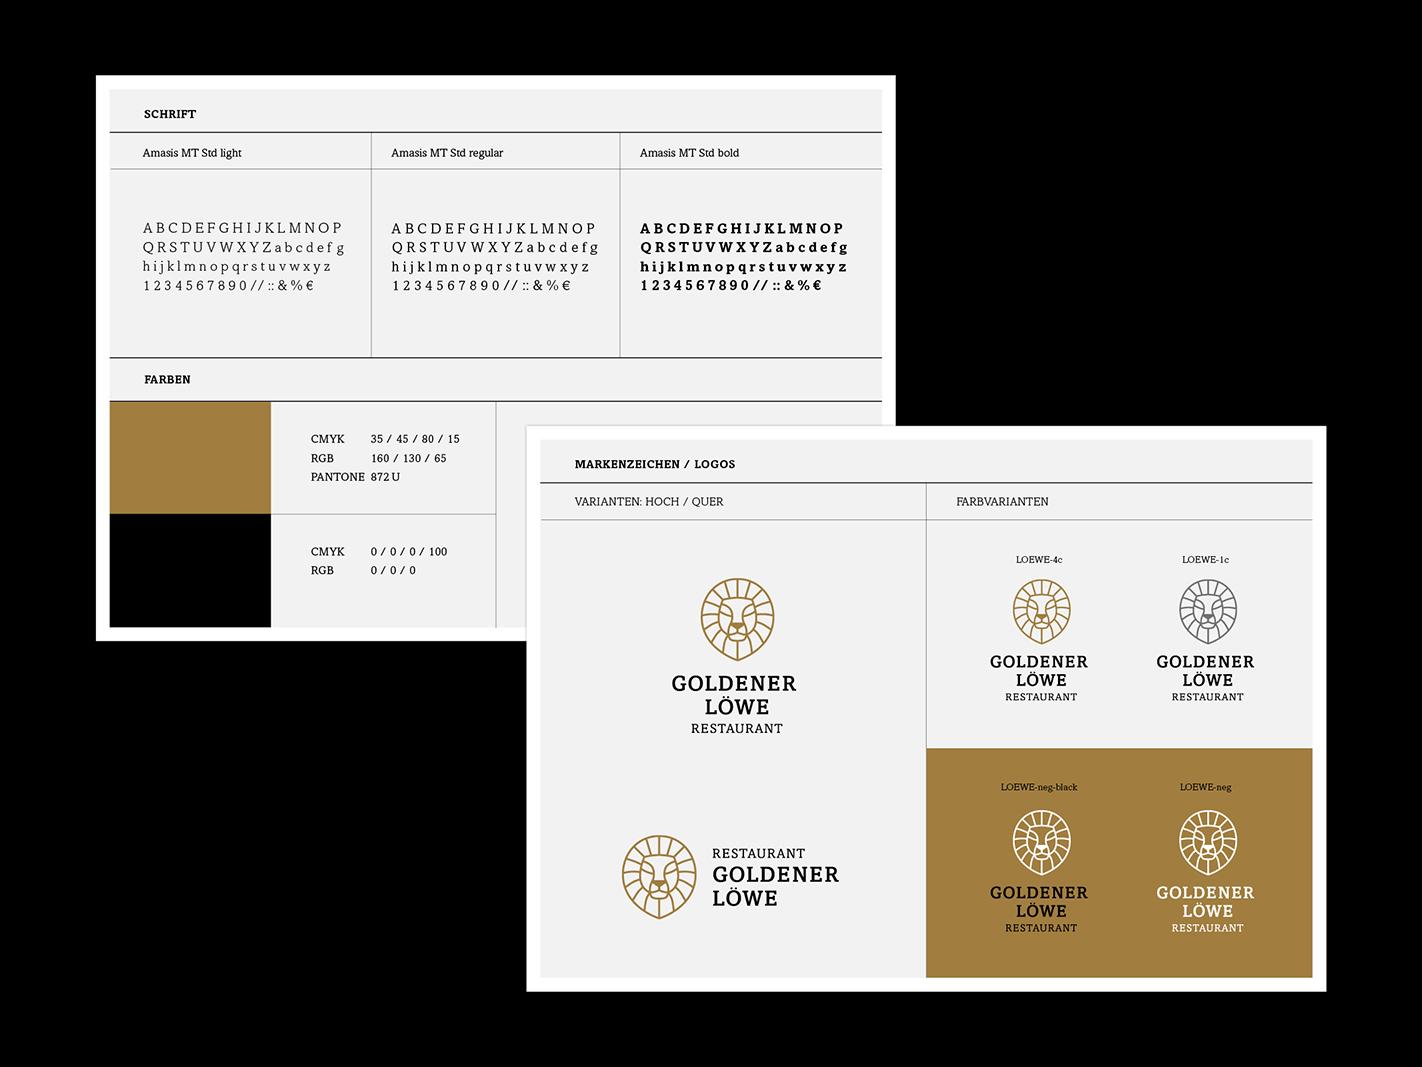 ATK-GOLDENER-LOEWE-RESTAURANT-Corporate-Design-8.jpg